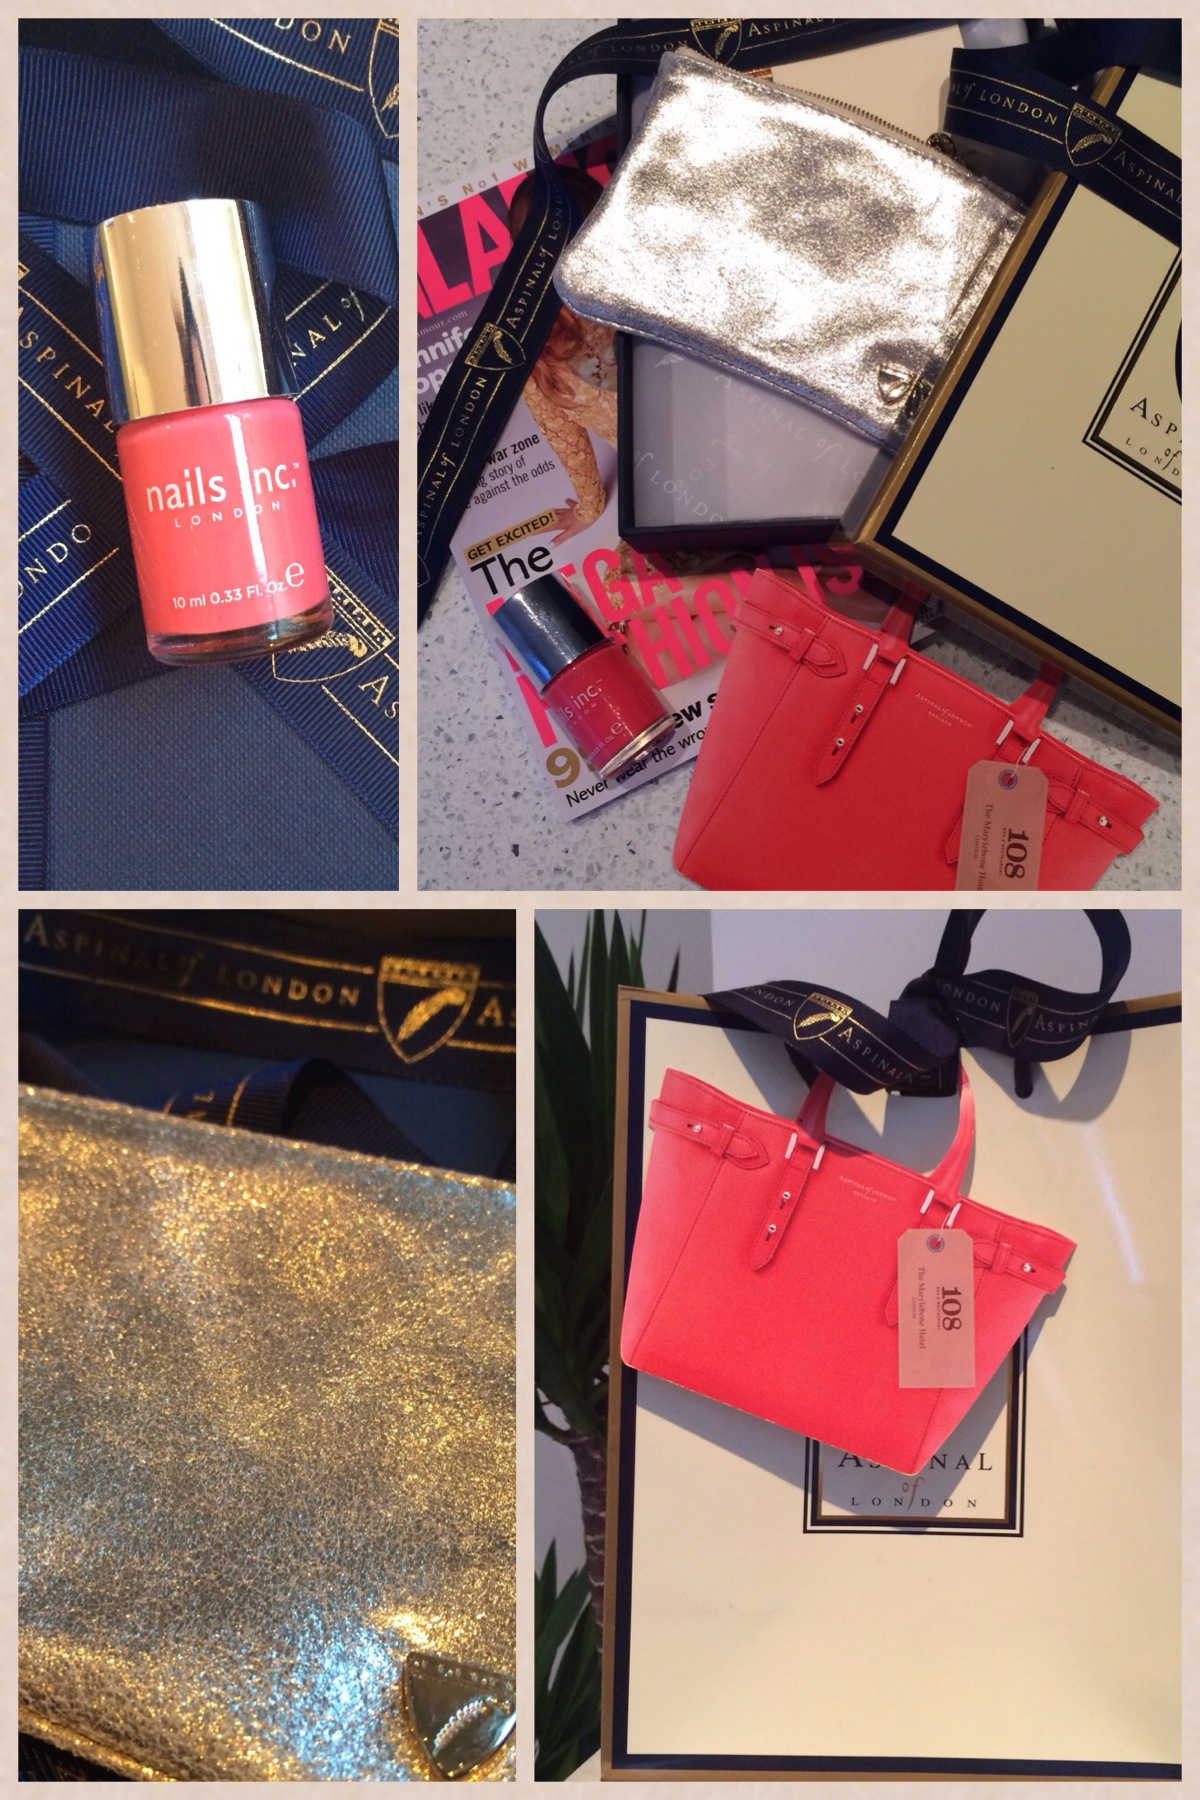 London Fashion Week goodie bags - Aspinal of London goodie bag, Nails inc brook street nail polish